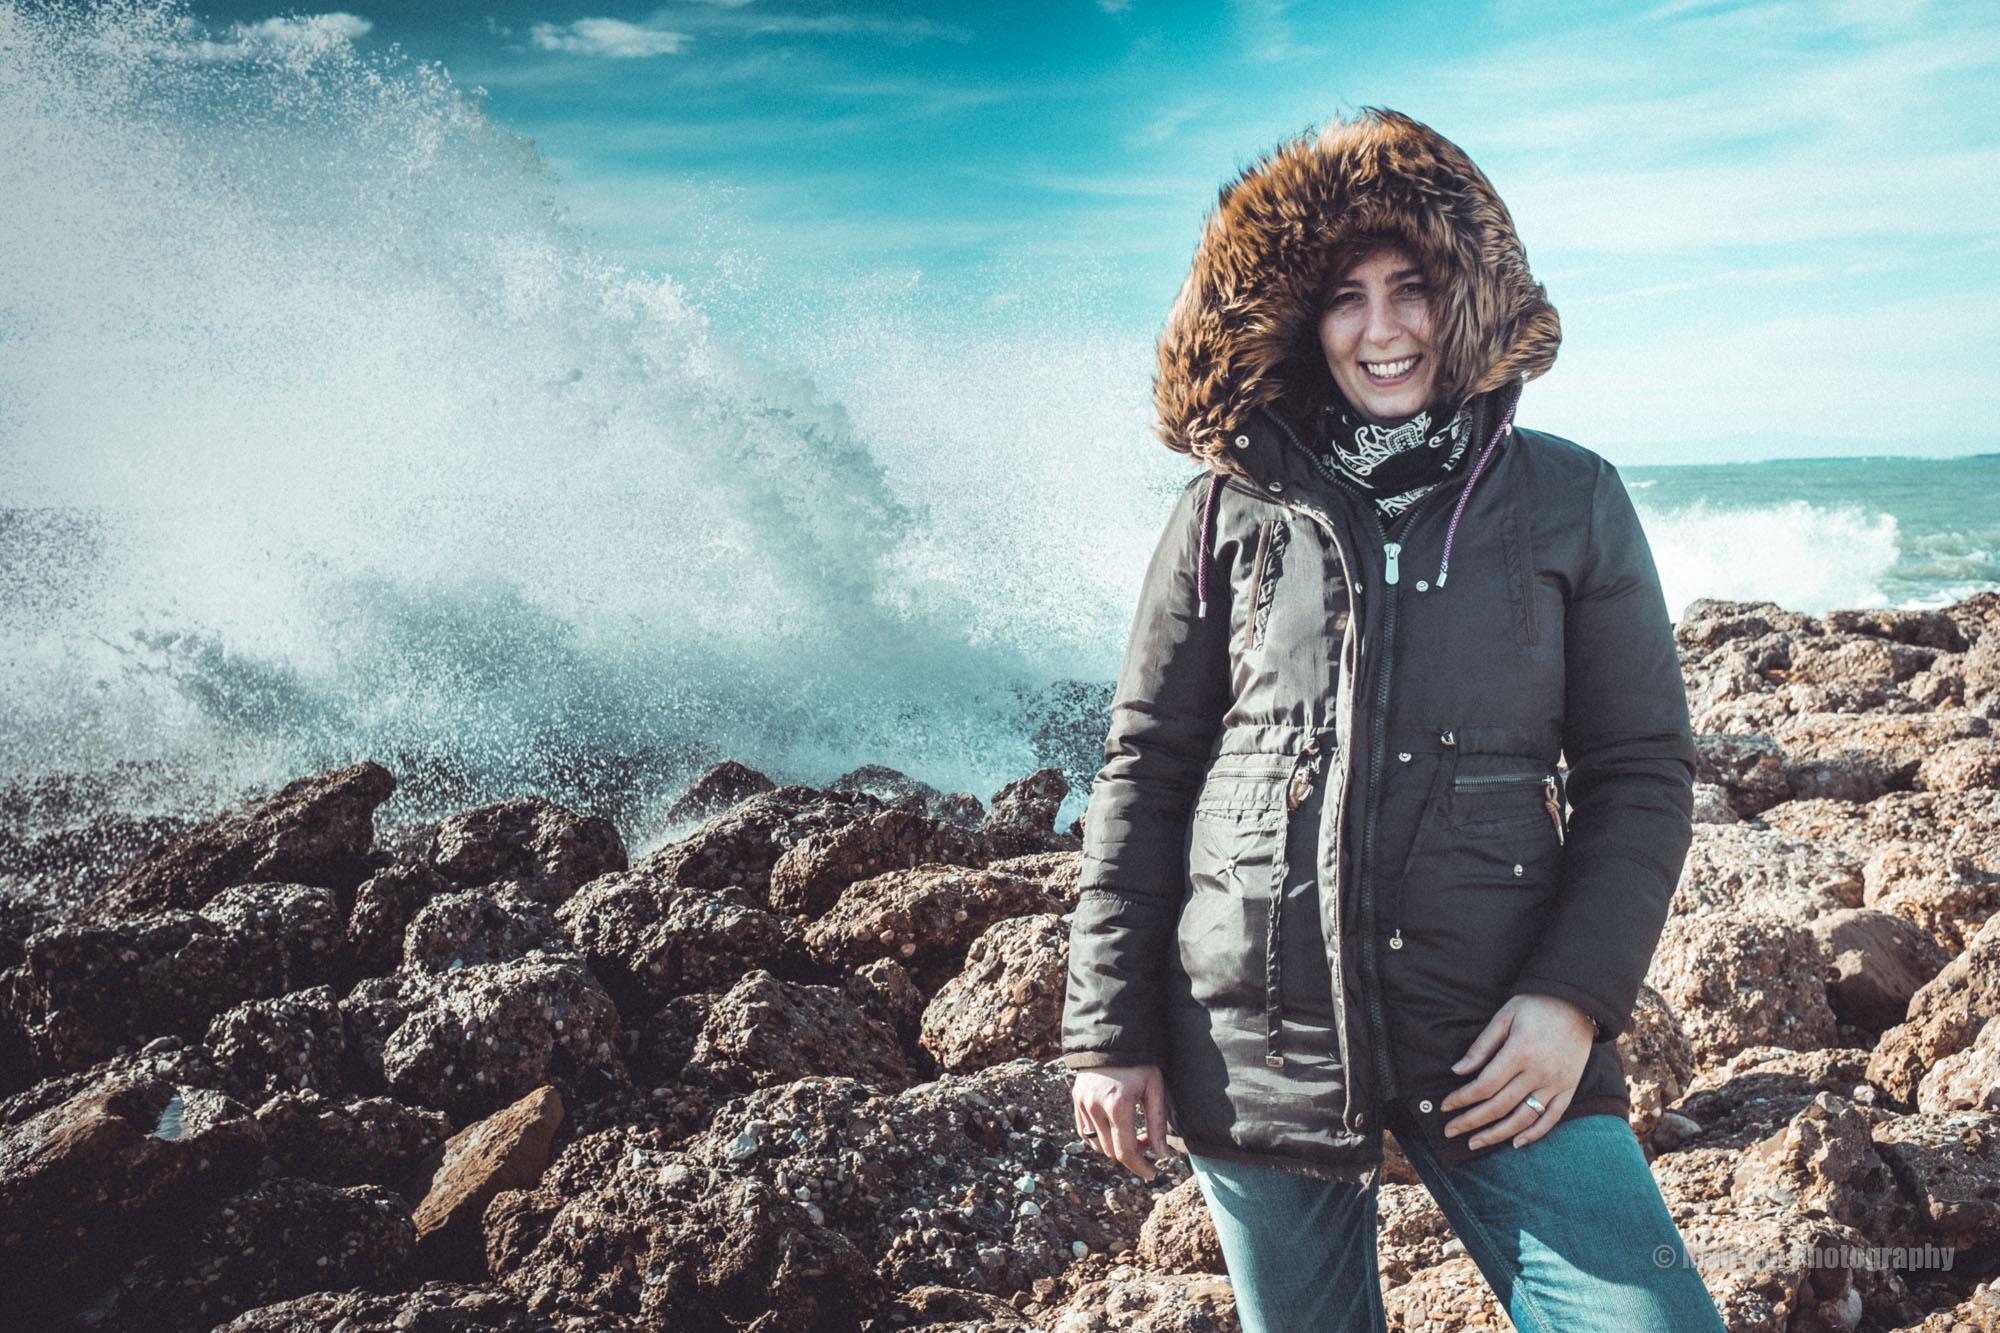 Die perfekte Welle © Mallaun Photography